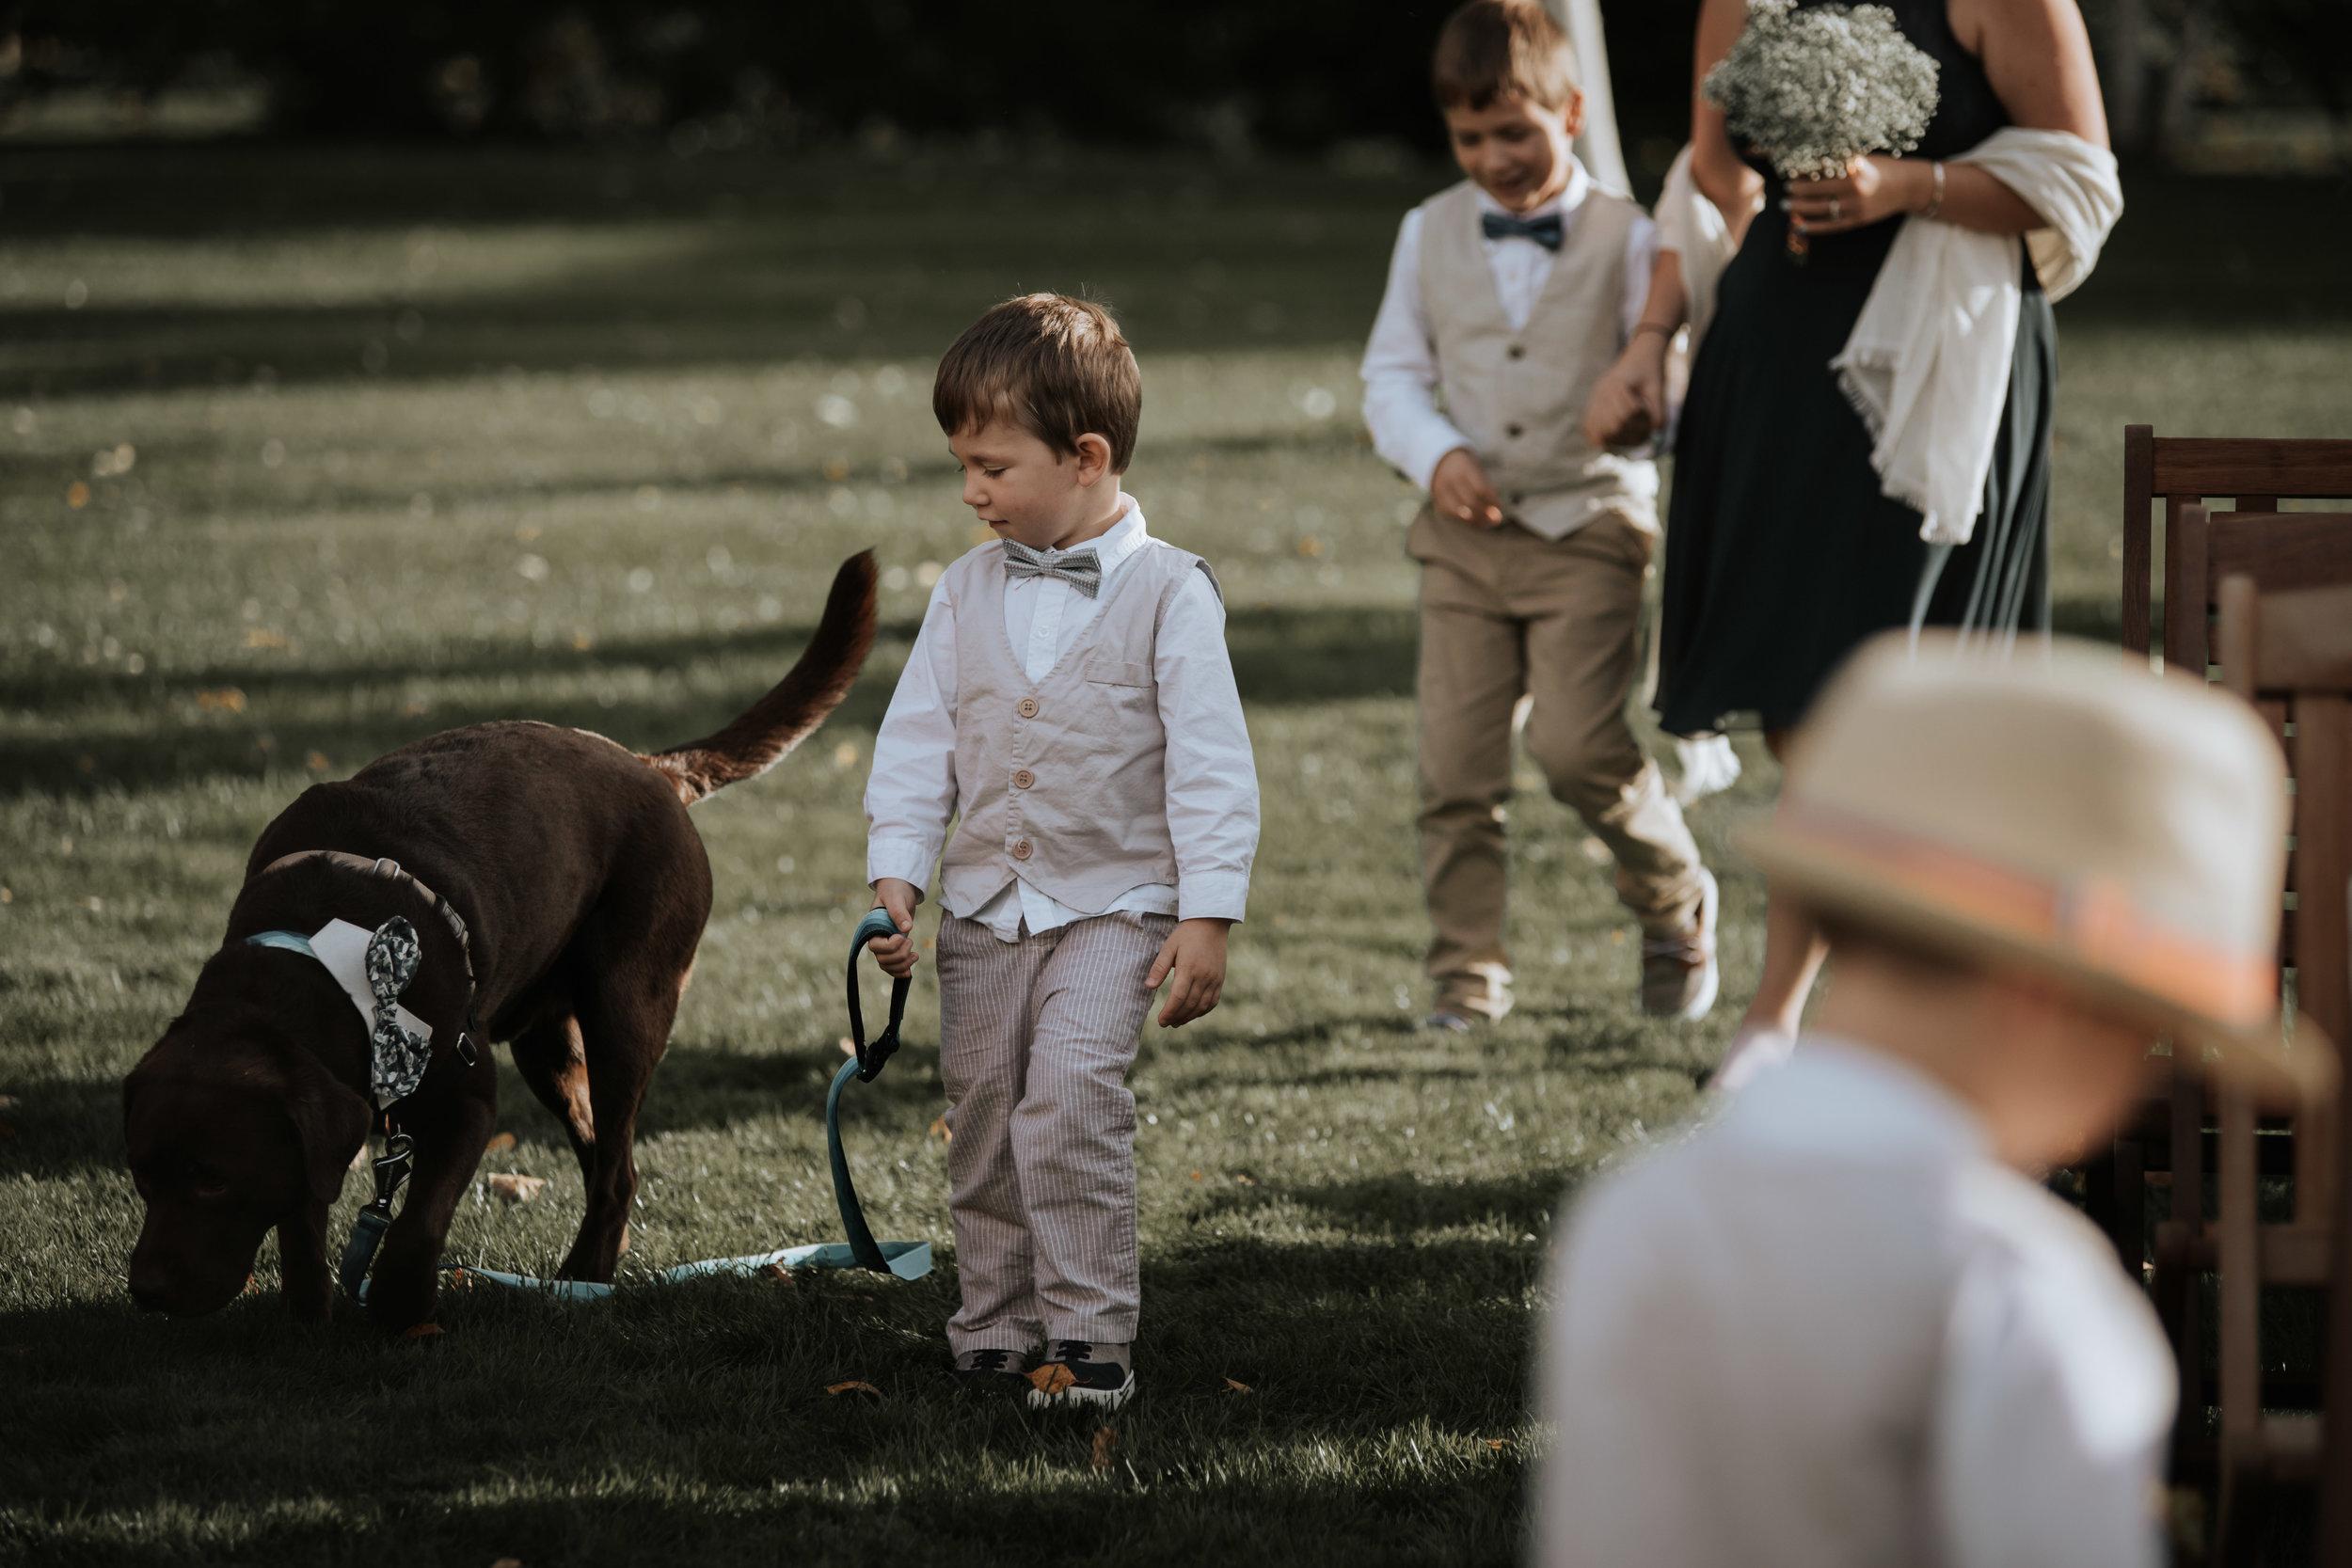 Vermont Wedding | Lorianna Weathers Photography-0457.jpg